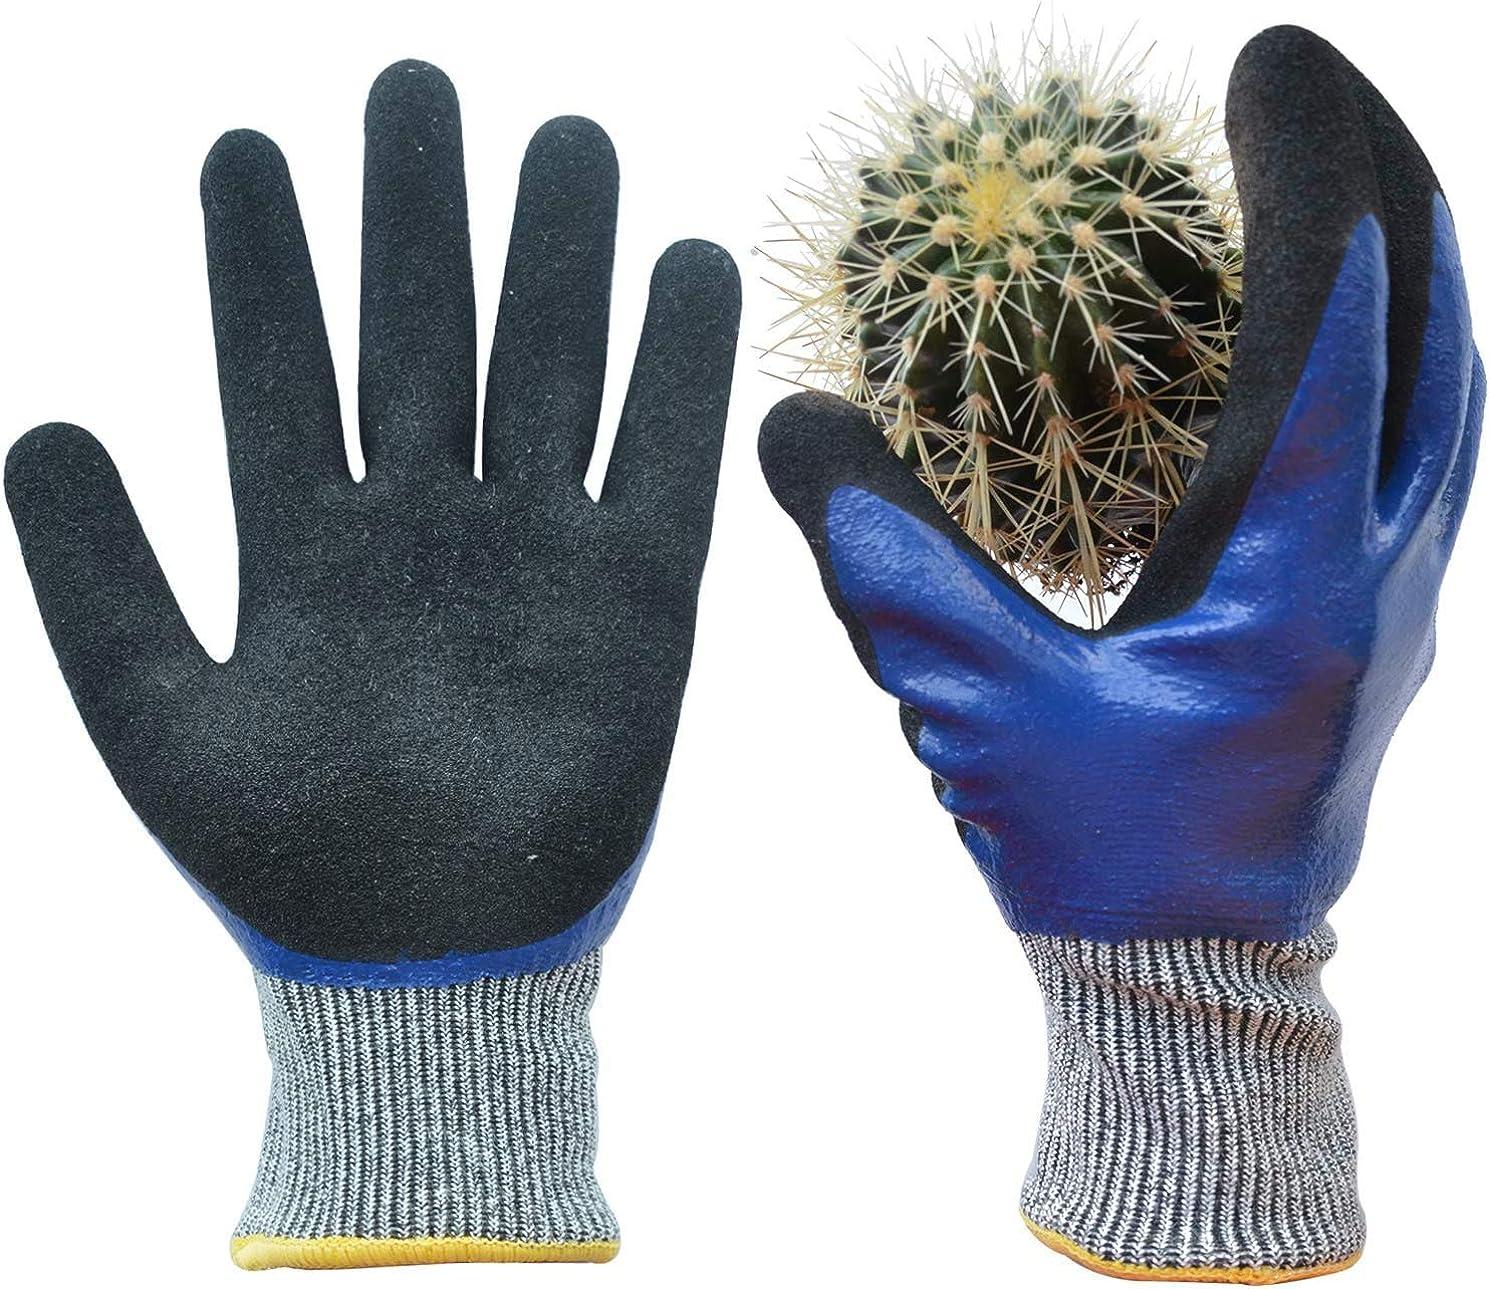 GLOSAV Durable Gardening Gloves, Heavy Duty Nitrile Garden Gloves, Double Coated